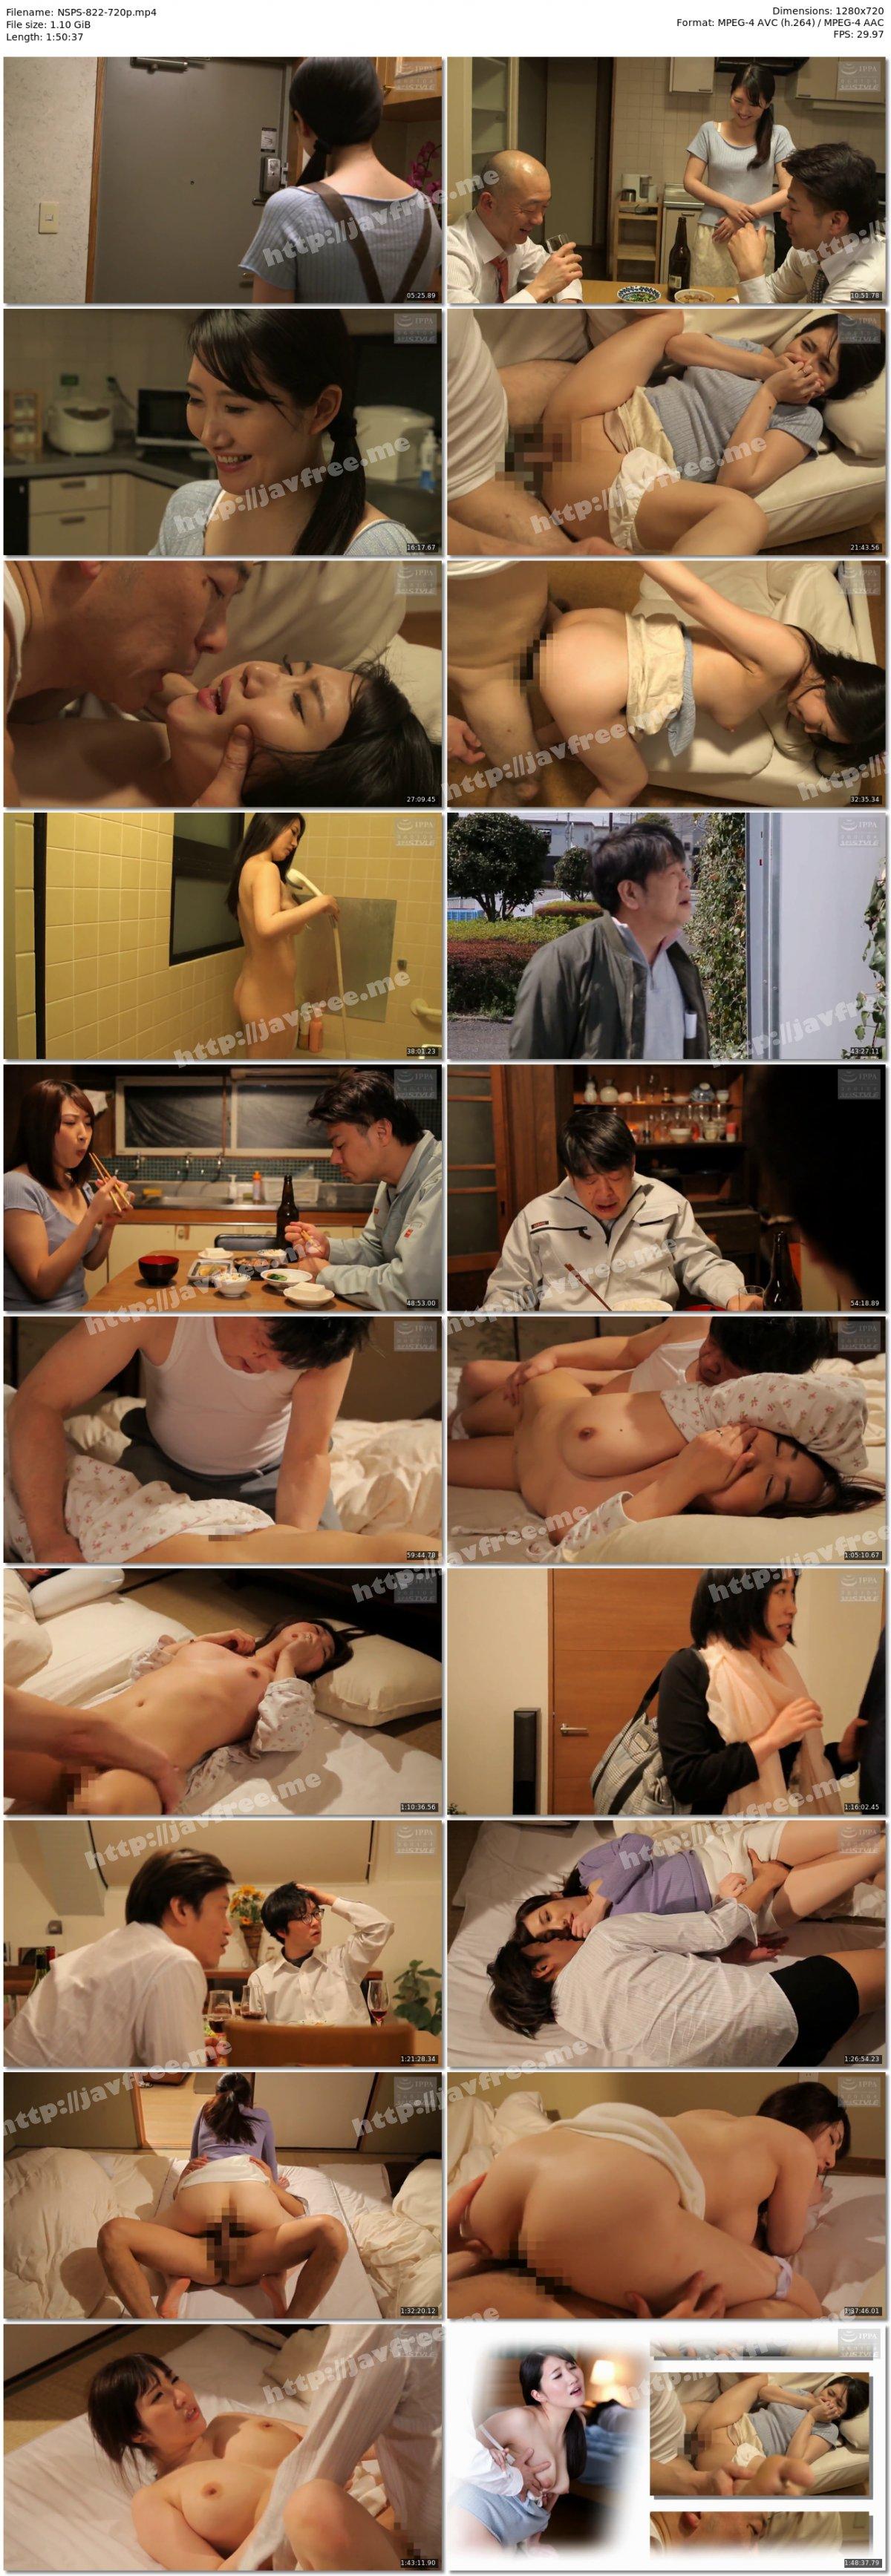 [HD][KNMD-033] 現代における奇譚な男女の物語 高宮菜々子 - image NSPS-822-720p on https://javfree.me